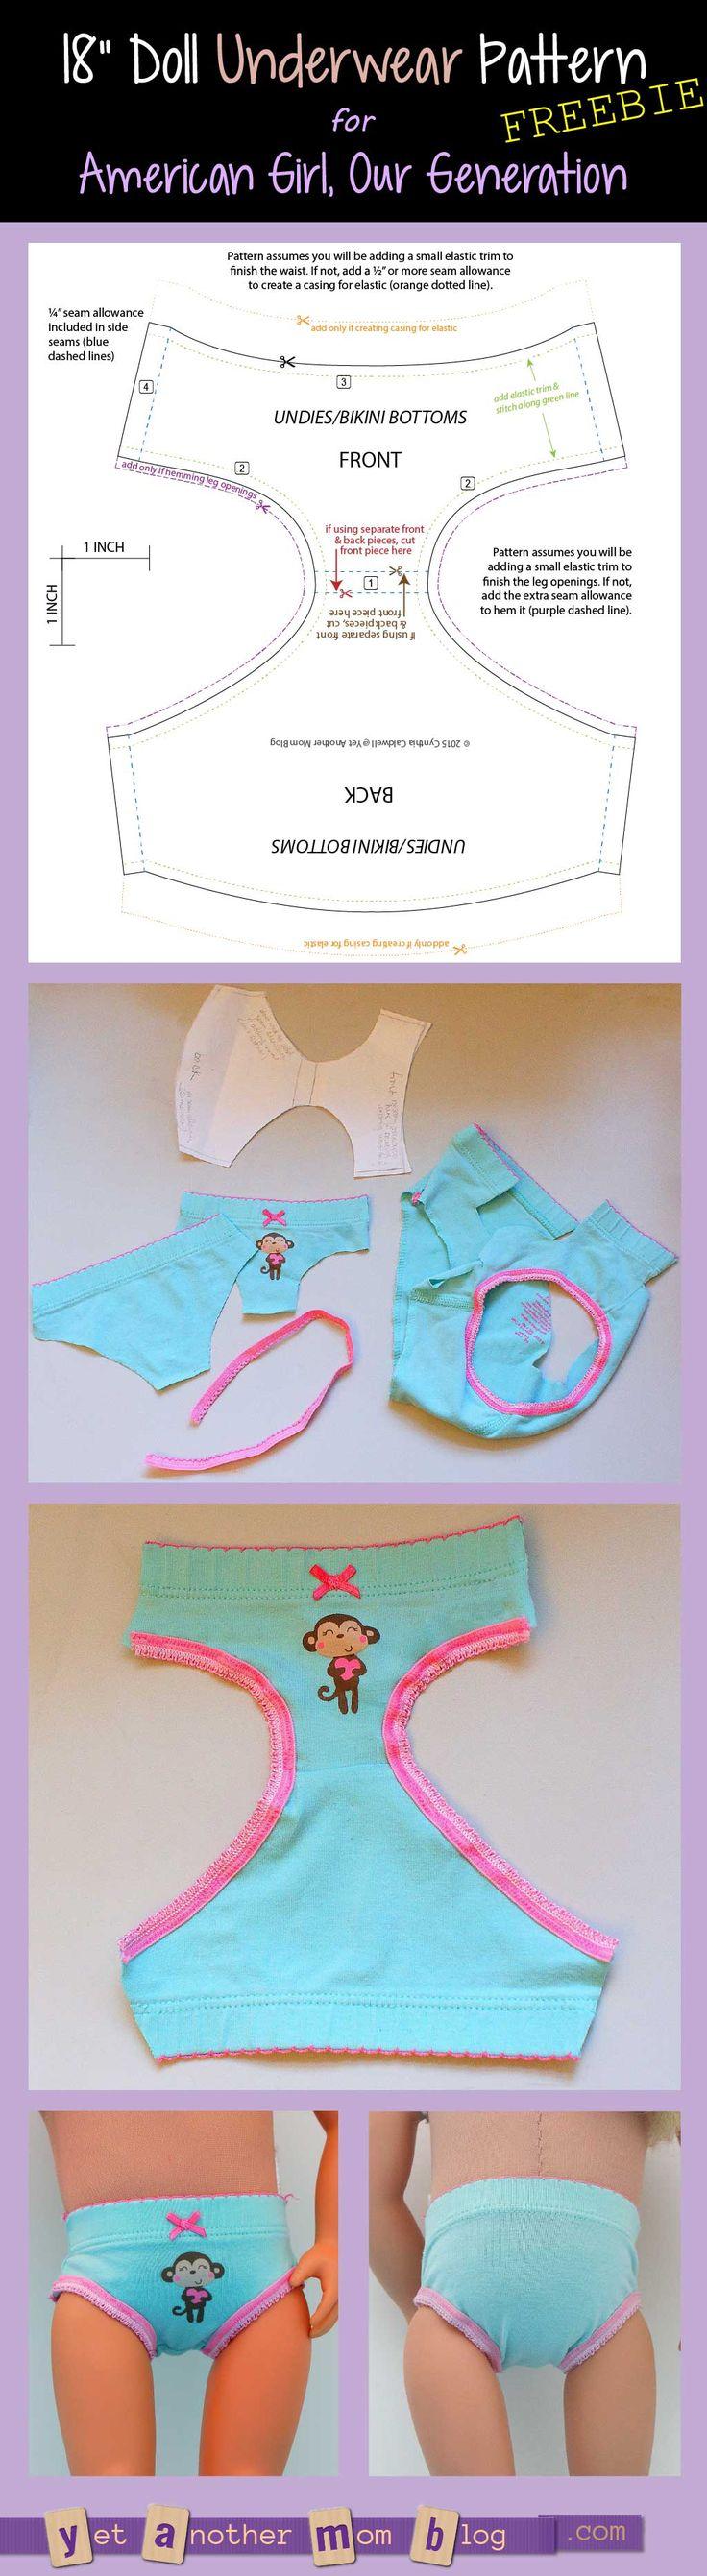 American Girl/Our Generation Doll underwear pattern freebie - shrink for Blythe